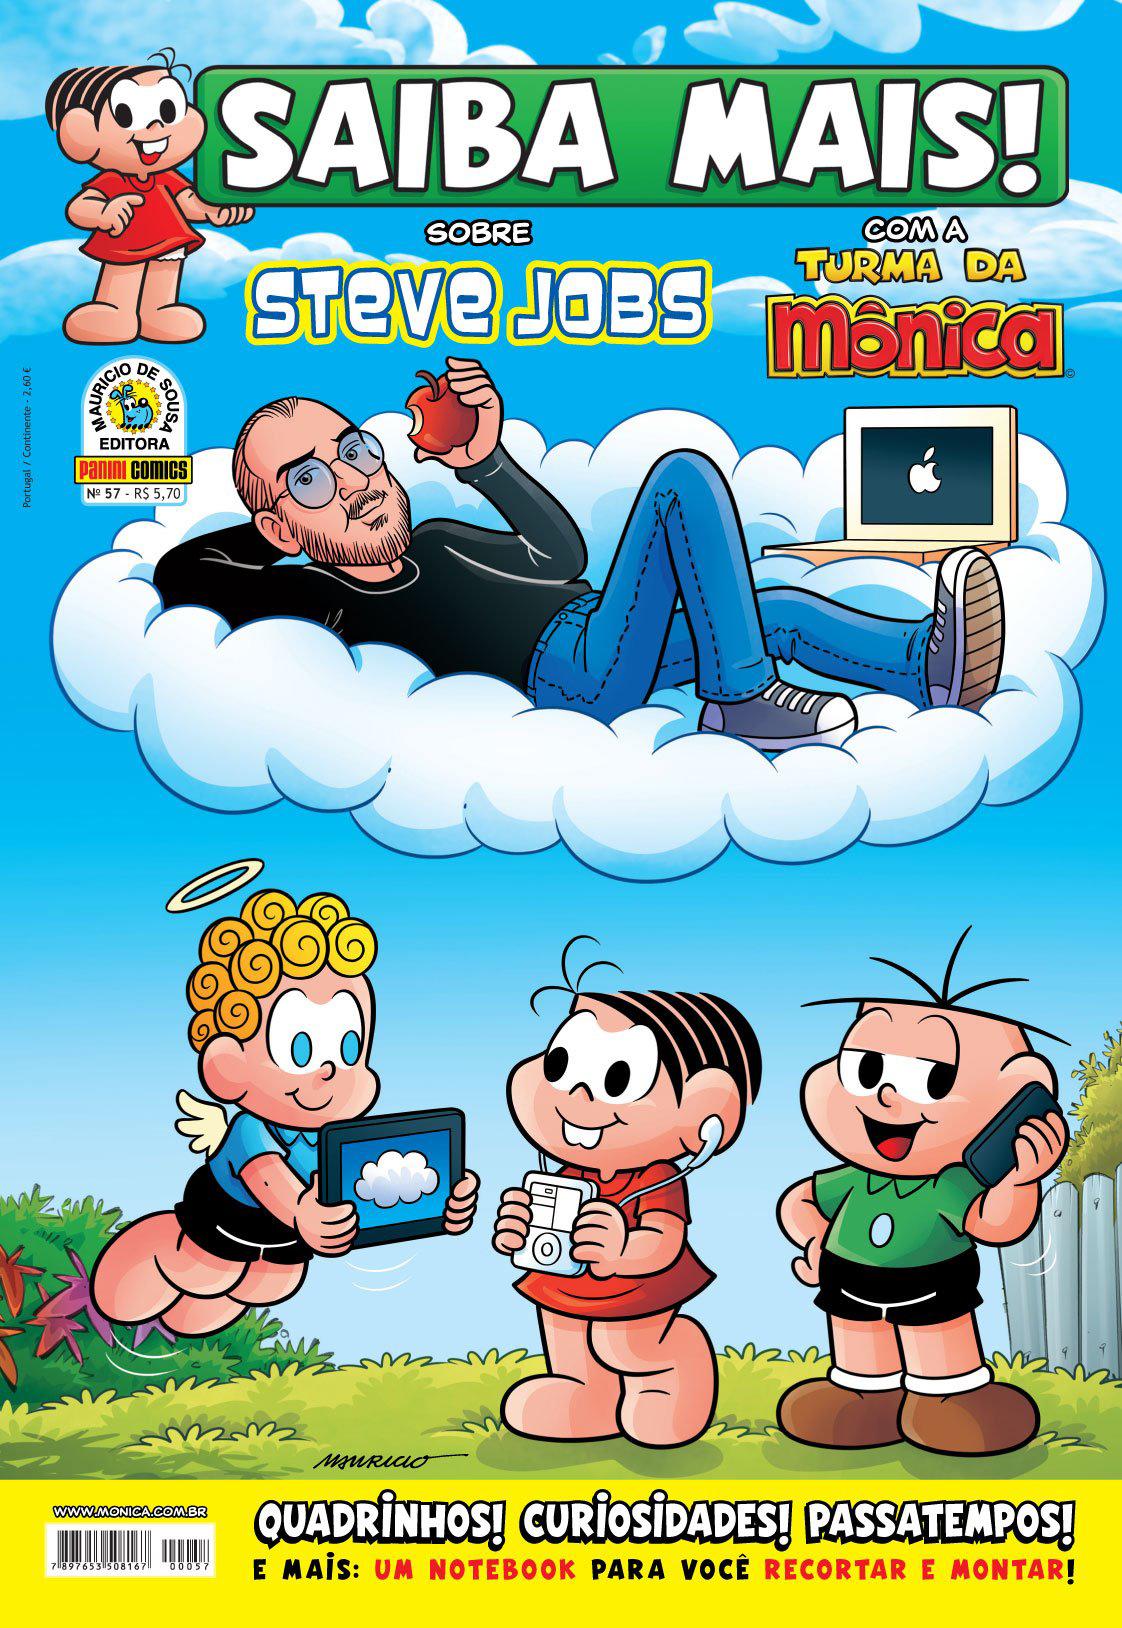 Steve Jobs na Turma da Mônica